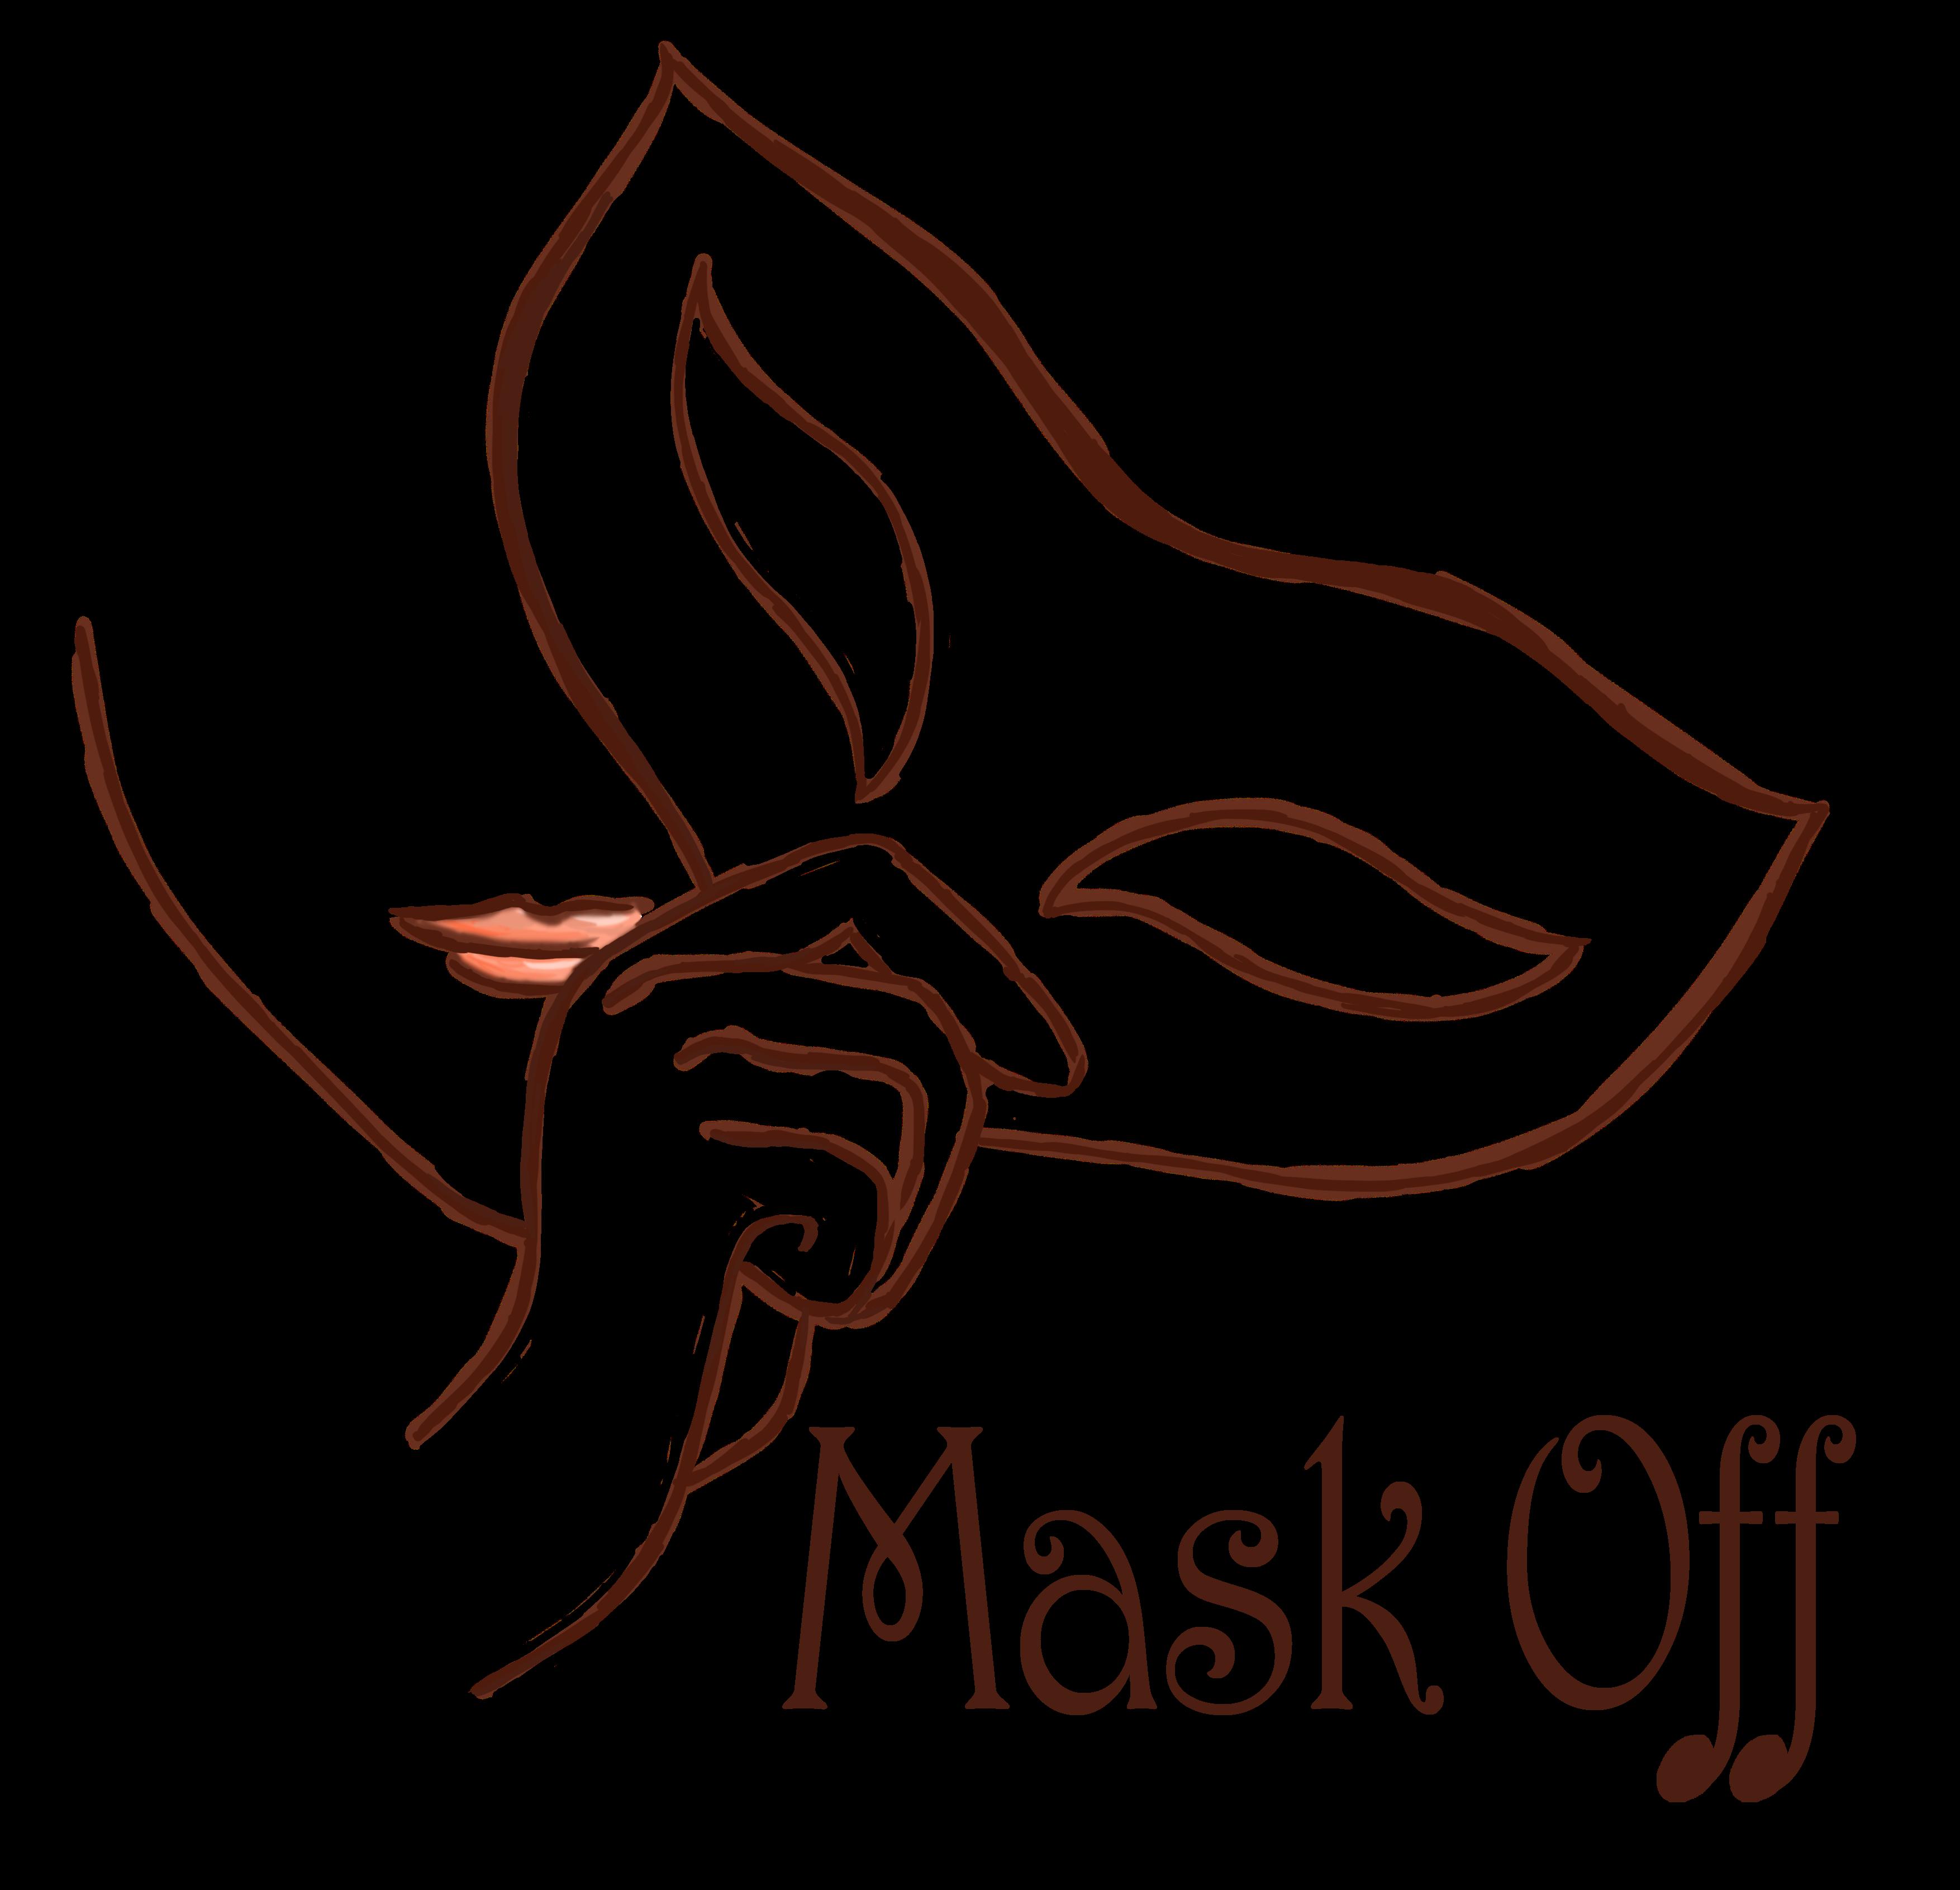 Maskoff Music